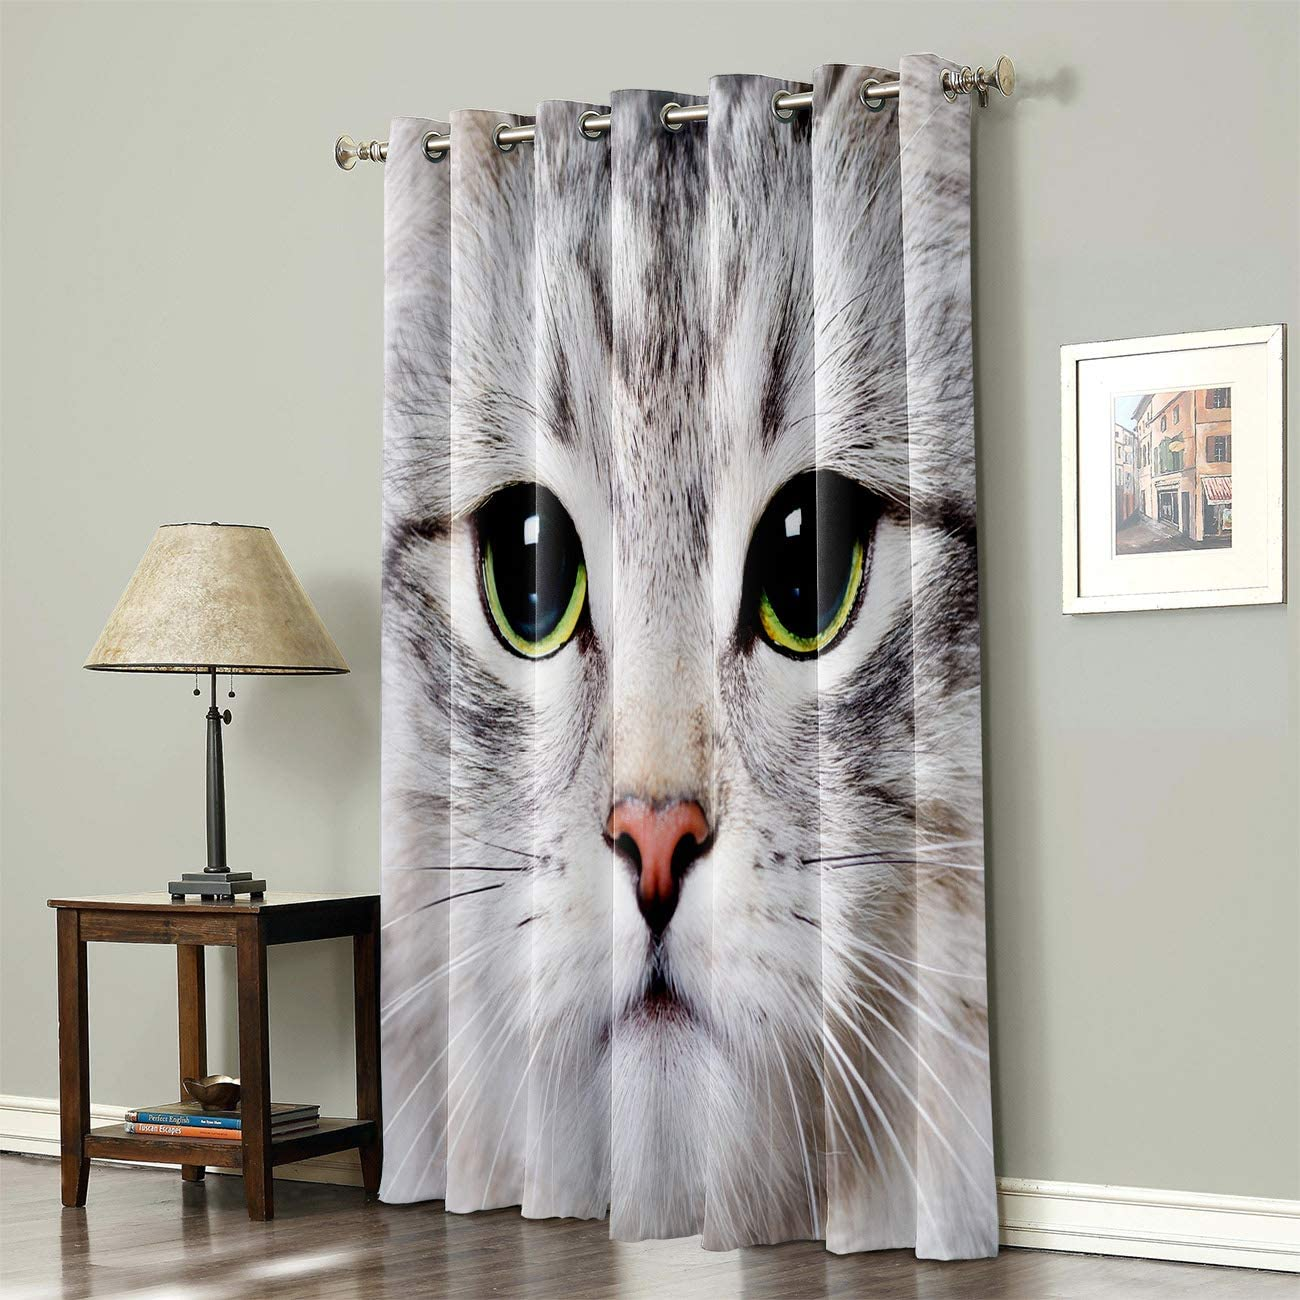 SODIKA 開催中 Grommet Top Curtains for Bedroom Treat Window Living Room 超特価